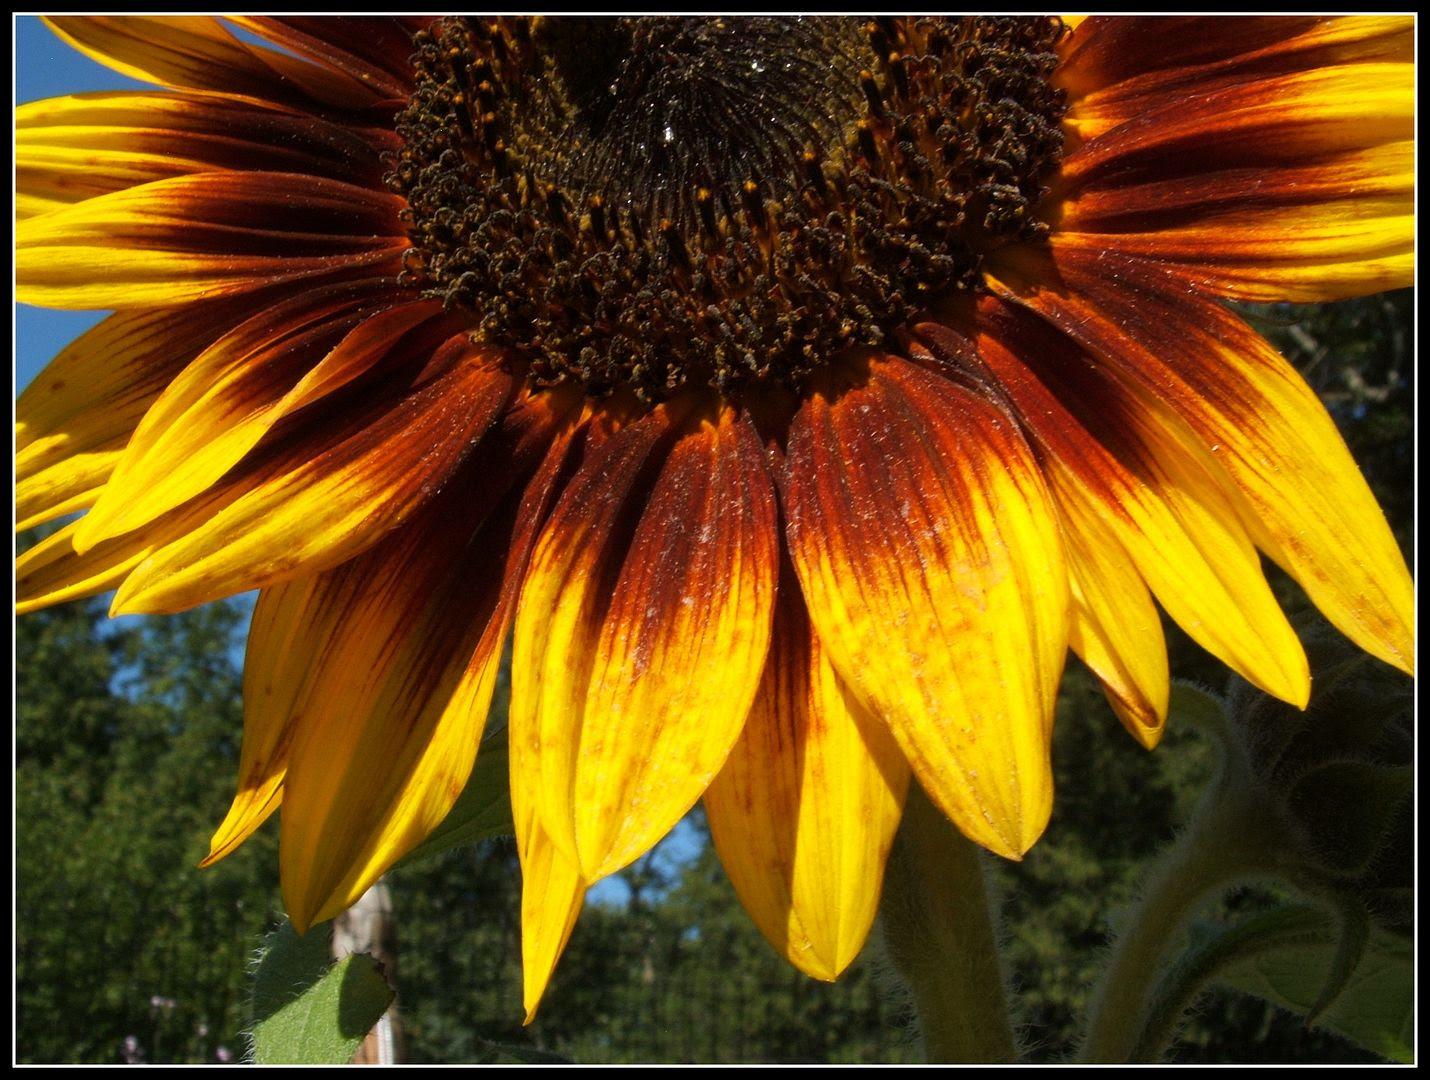 by Angie Ouellette-Tower for http://www.godsgrowinggarden.com/ photo DSCF9039_zpsokzu2lzk.jpg